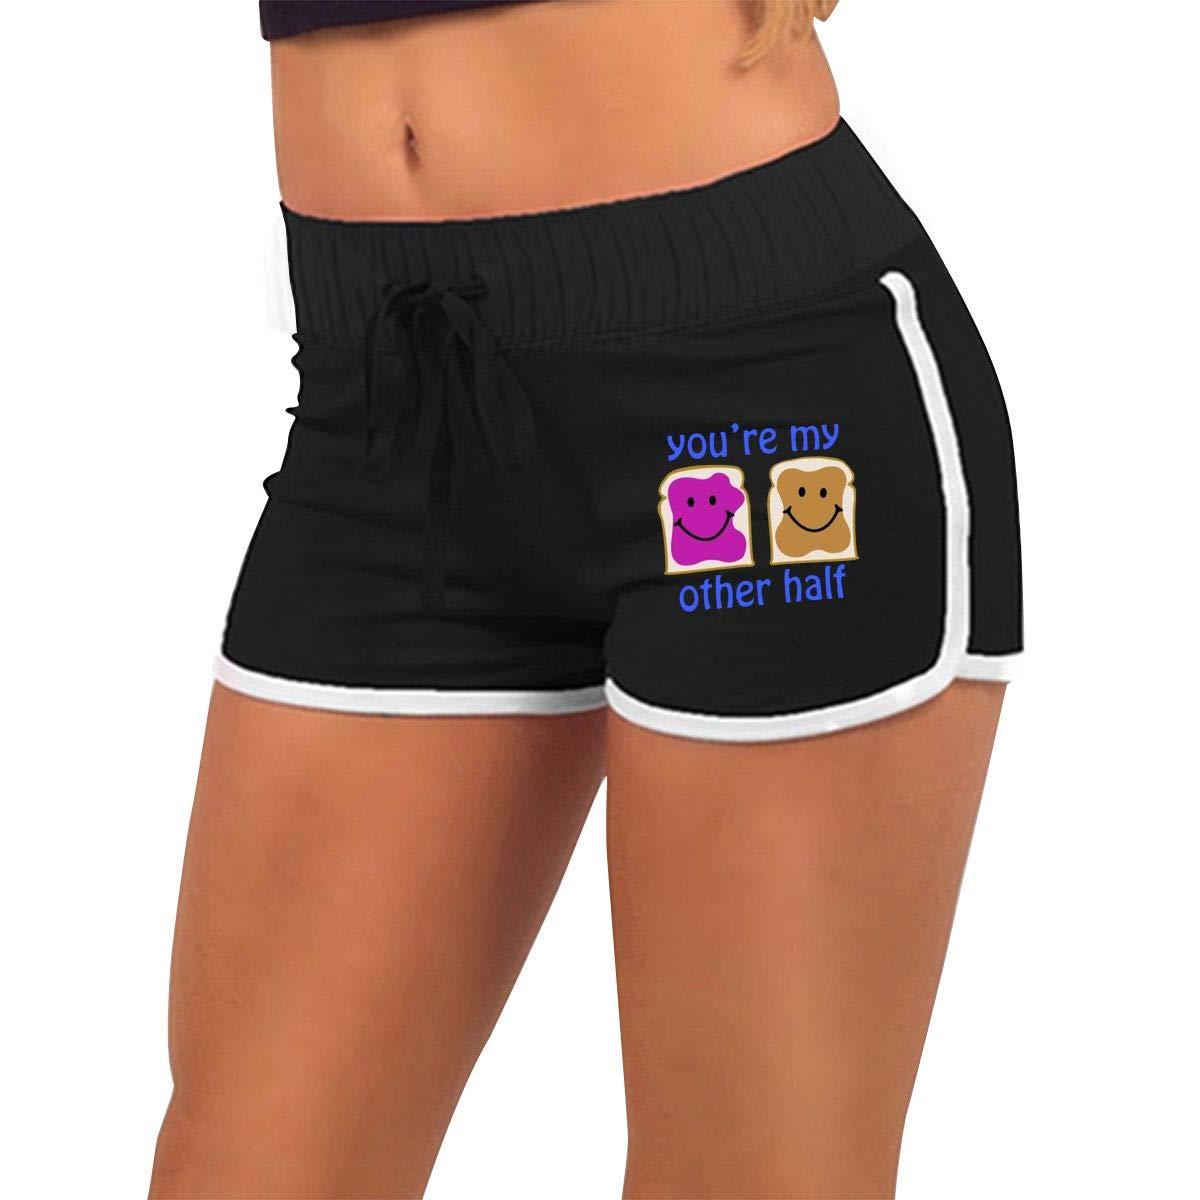 Womens Low Waist Yoga Hot Shorts Sports Shorts Summer Pants ...